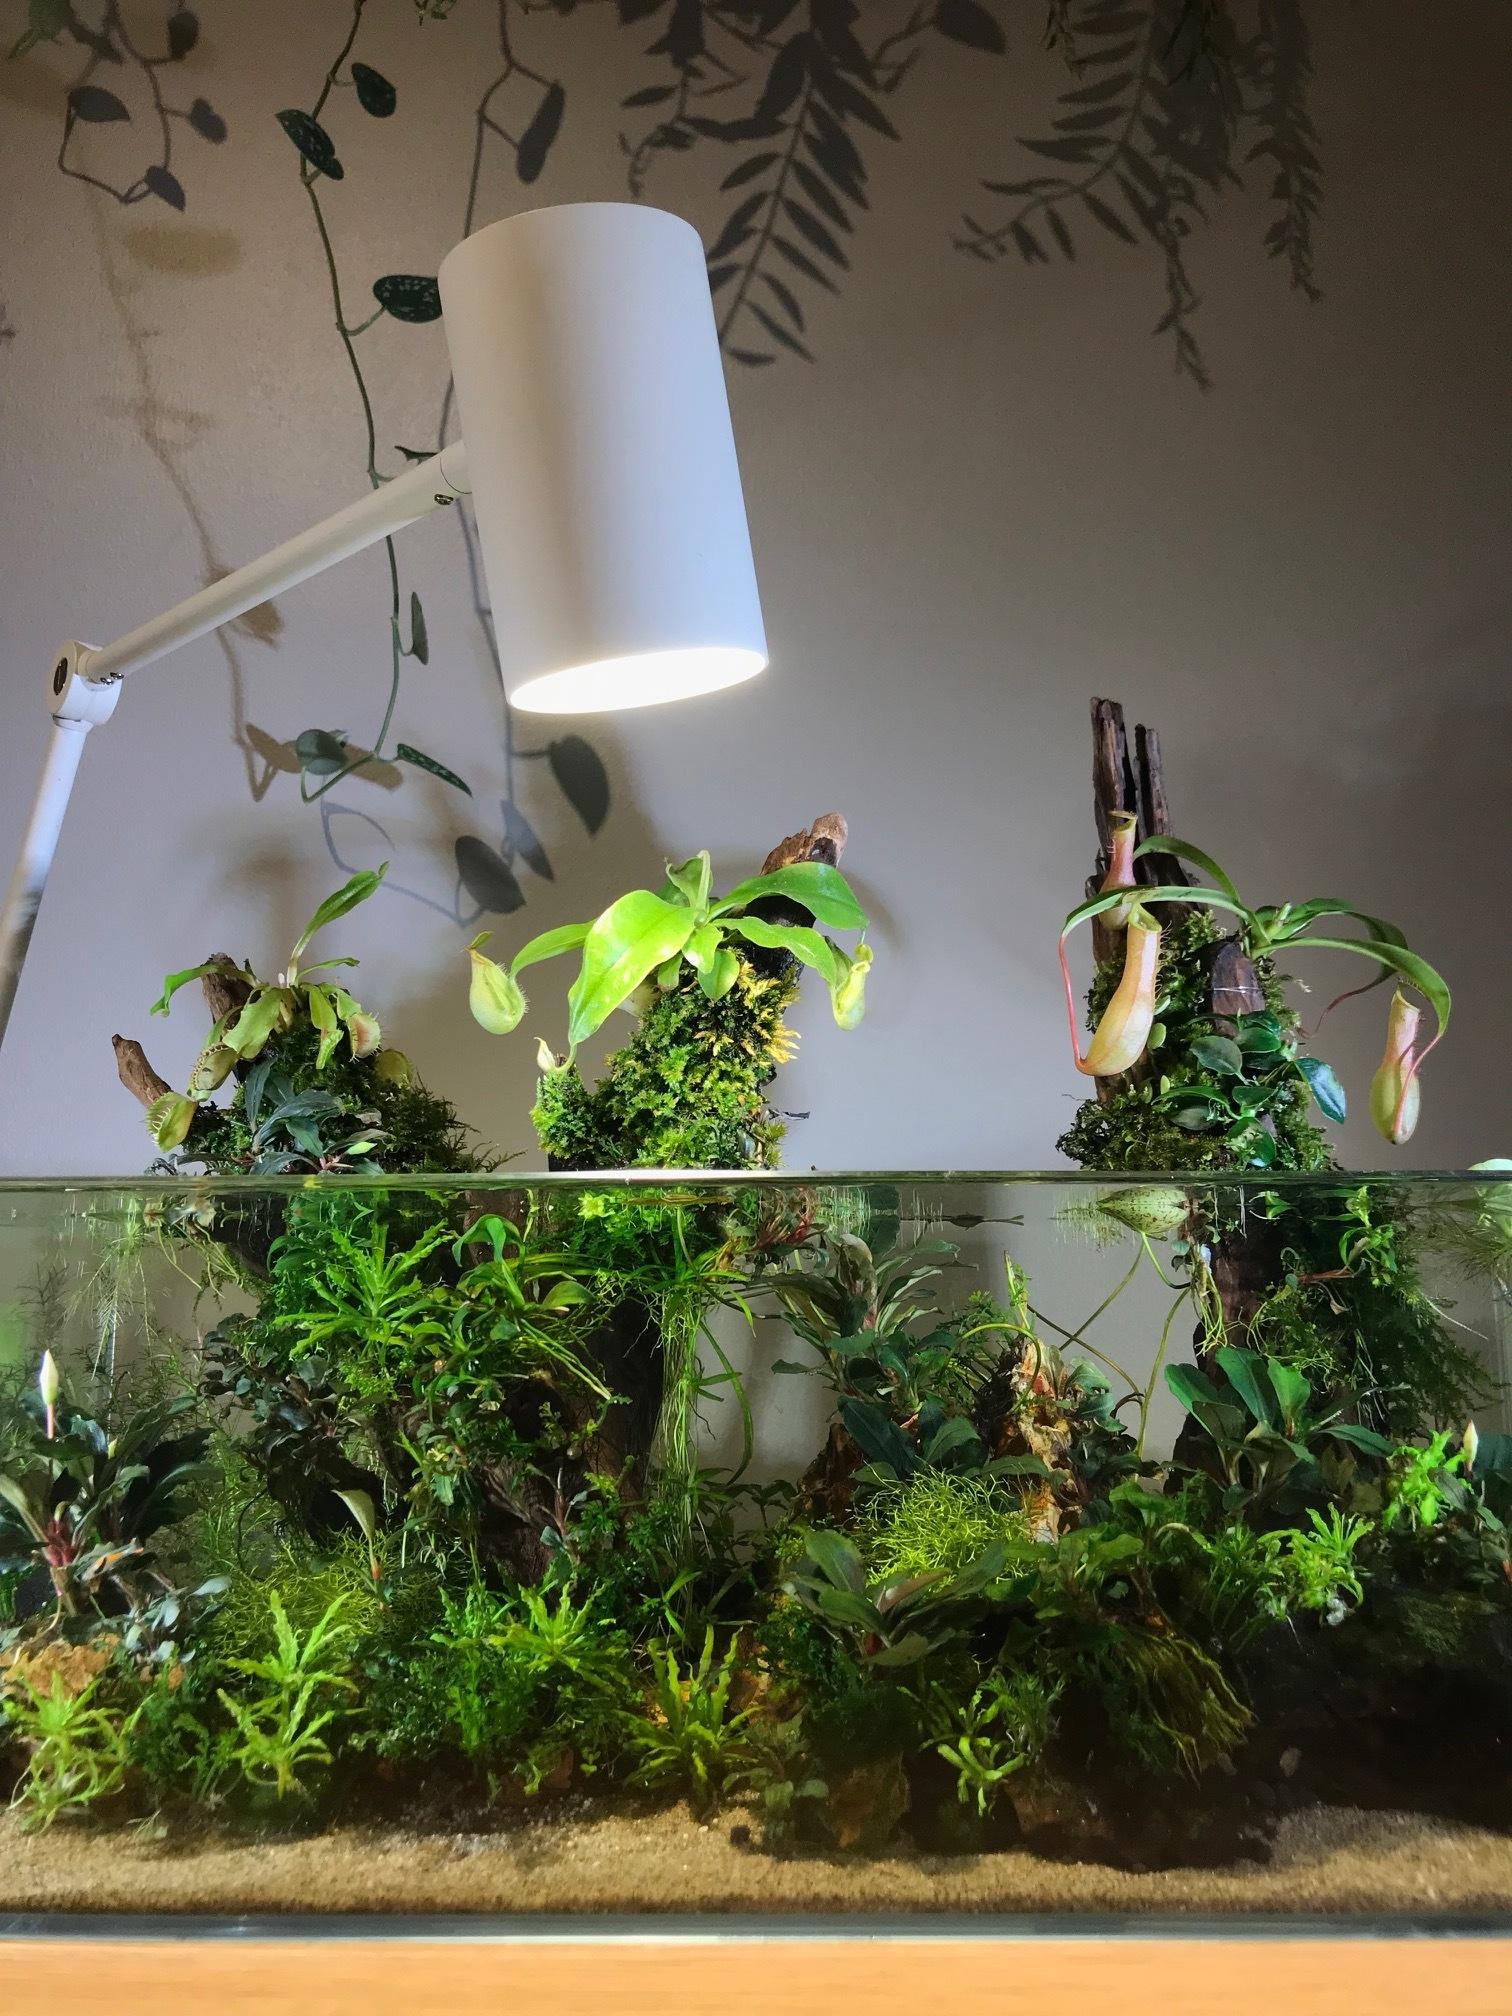 The nano-aquarium is lit by a single LED growlight. Photograph: James Wong.